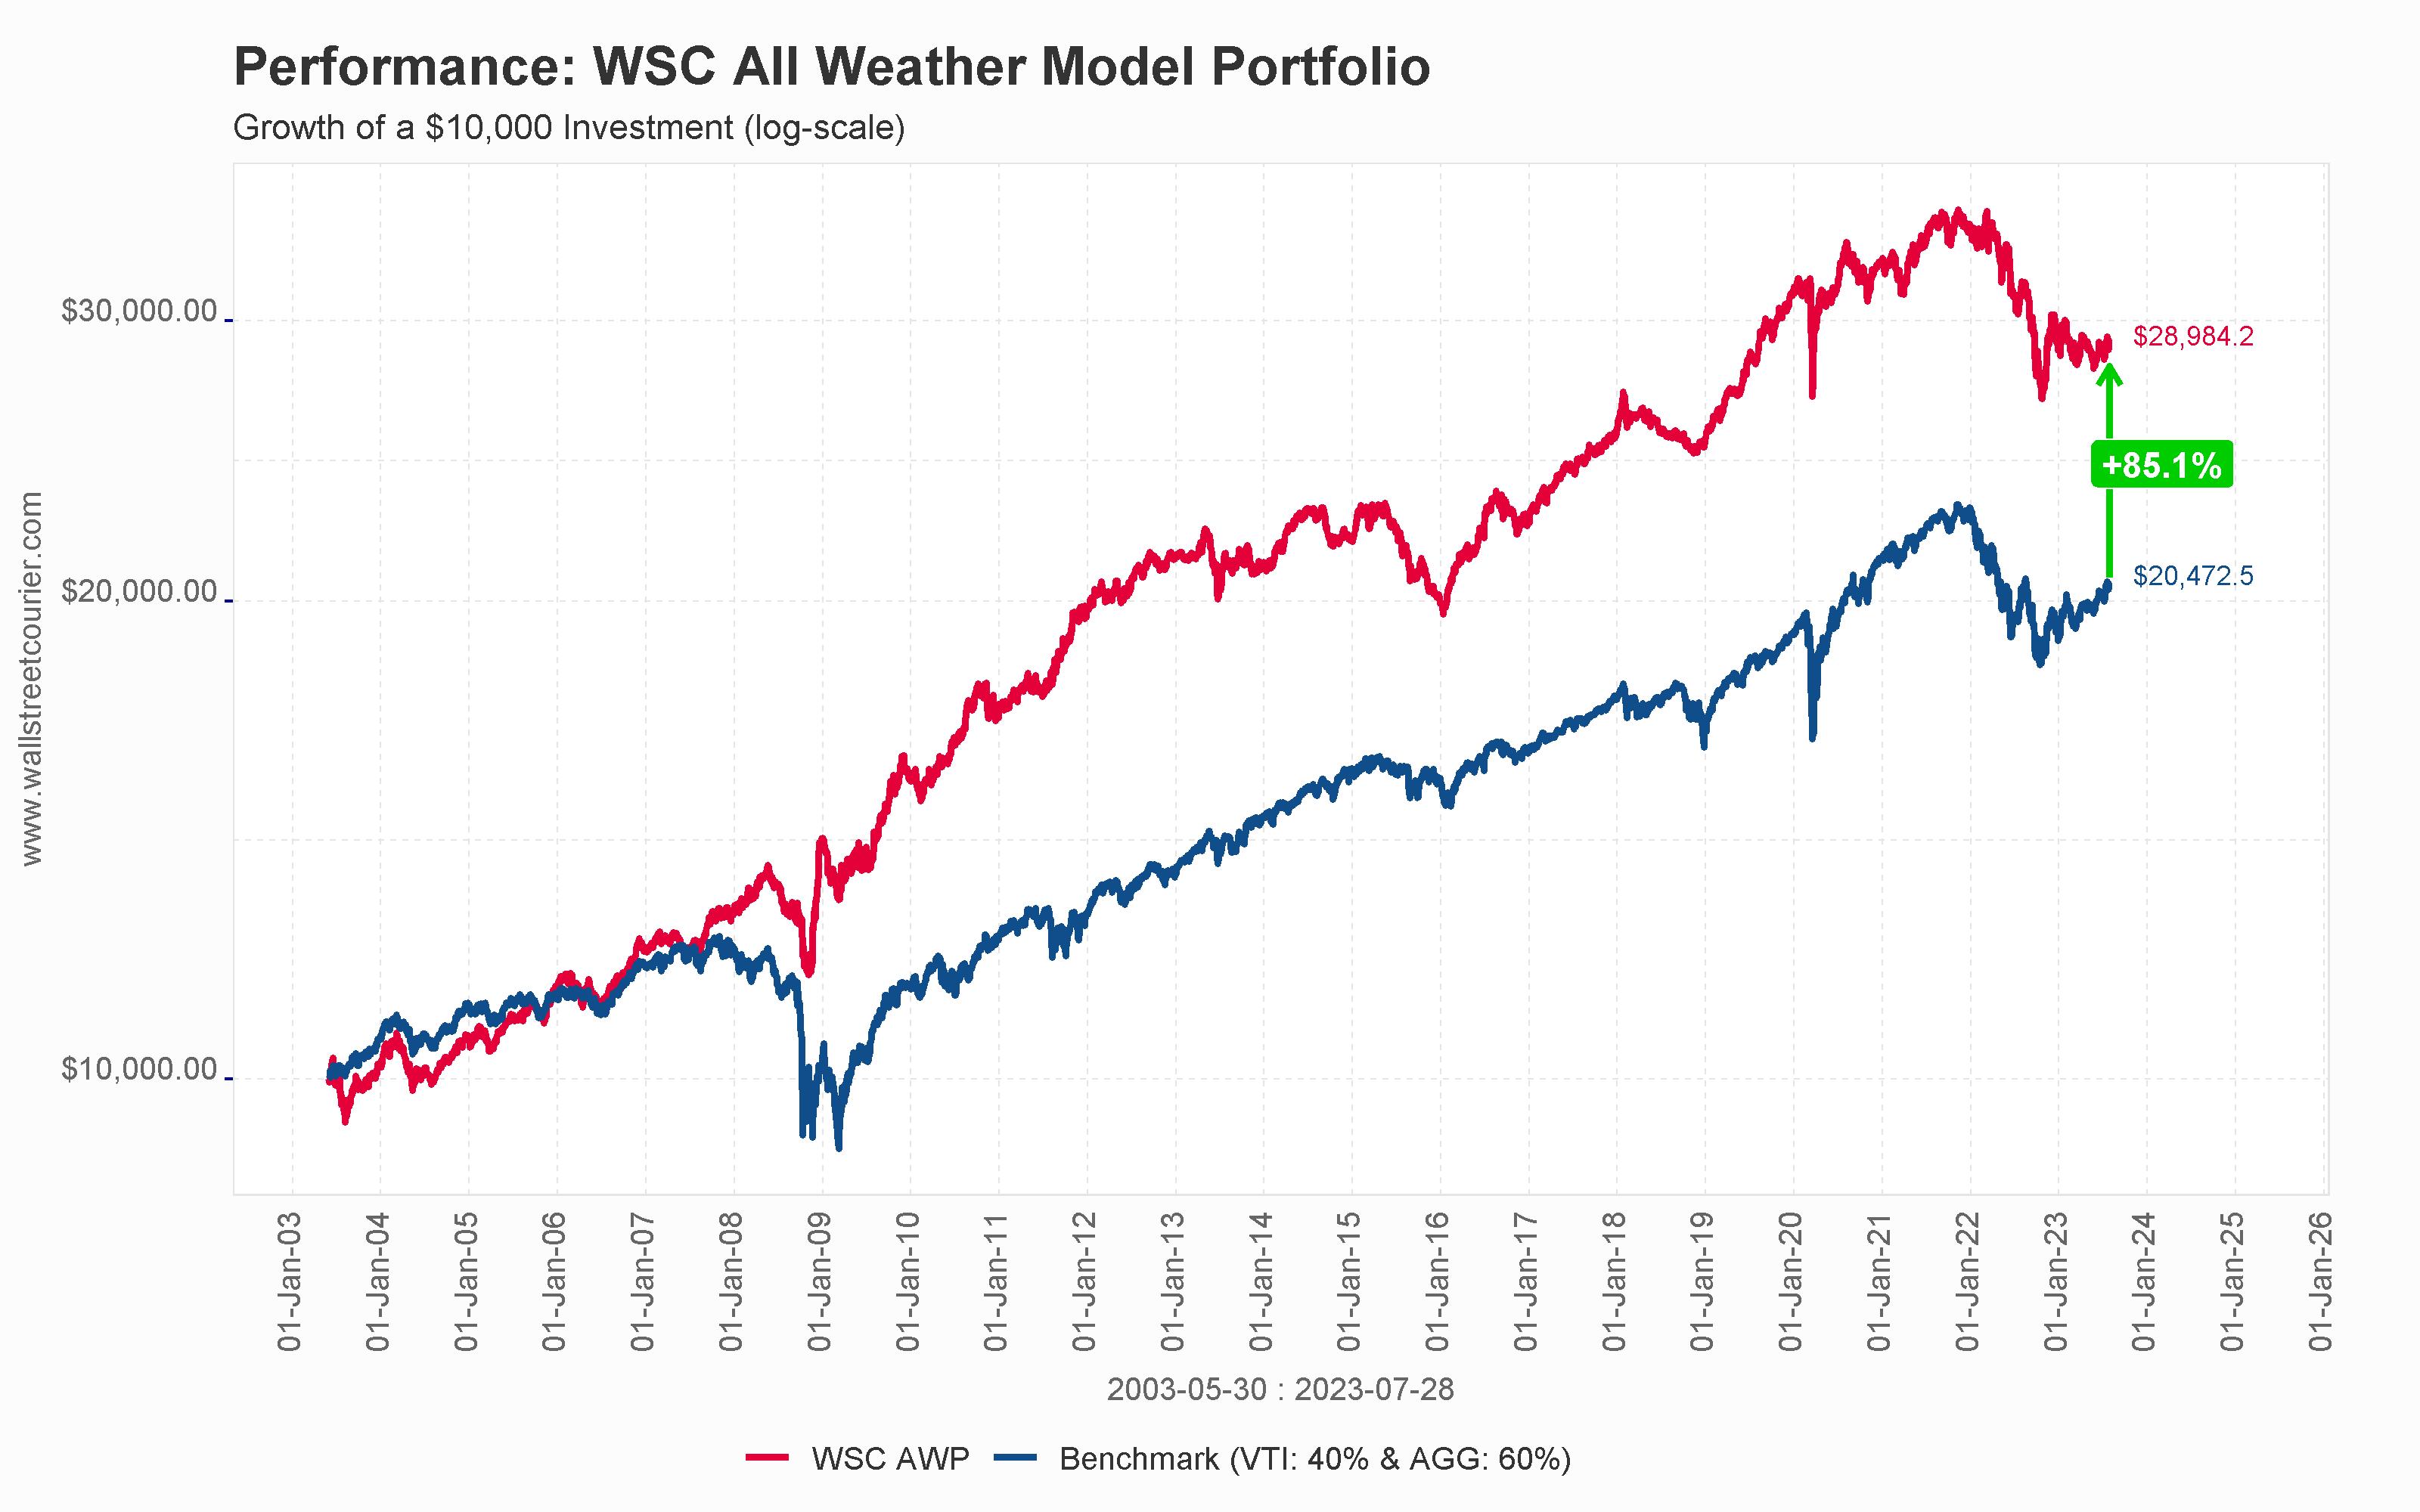 WSC All Weather Model Portfolio